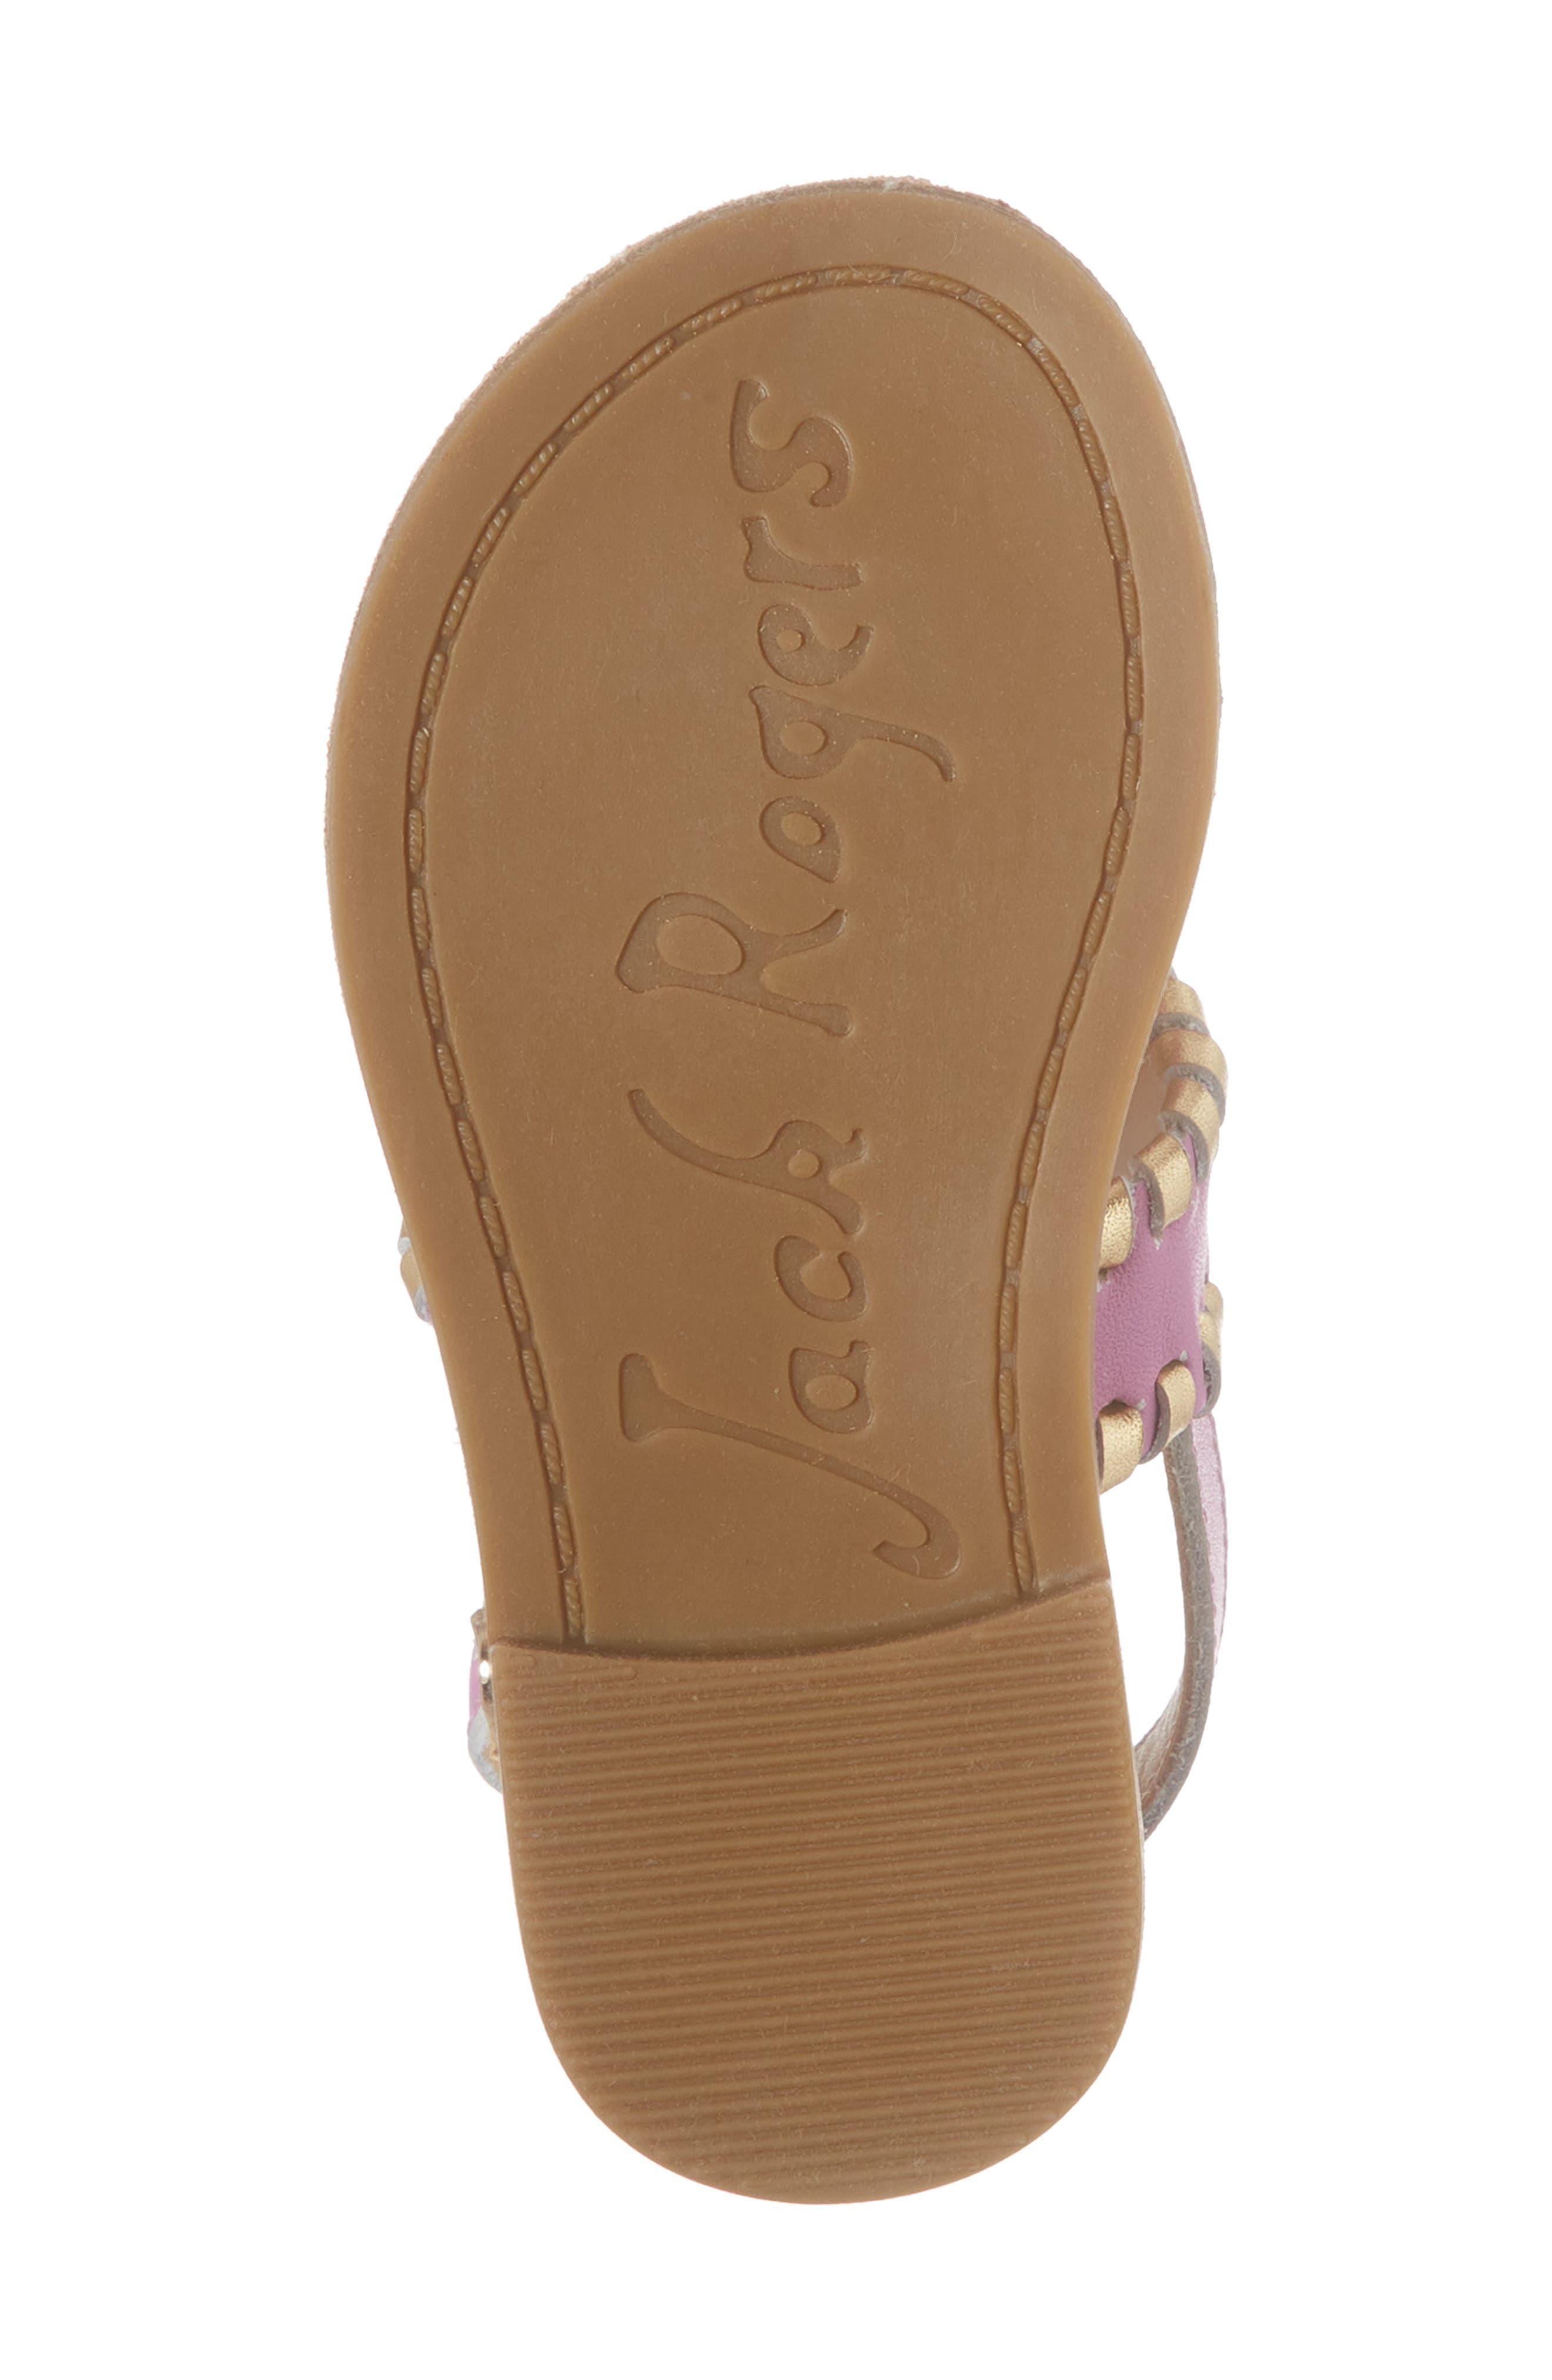 Little Miss Hollis Metallic Trim Sandal,                             Alternate thumbnail 6, color,                             Lavender Pink/ Gold Leather